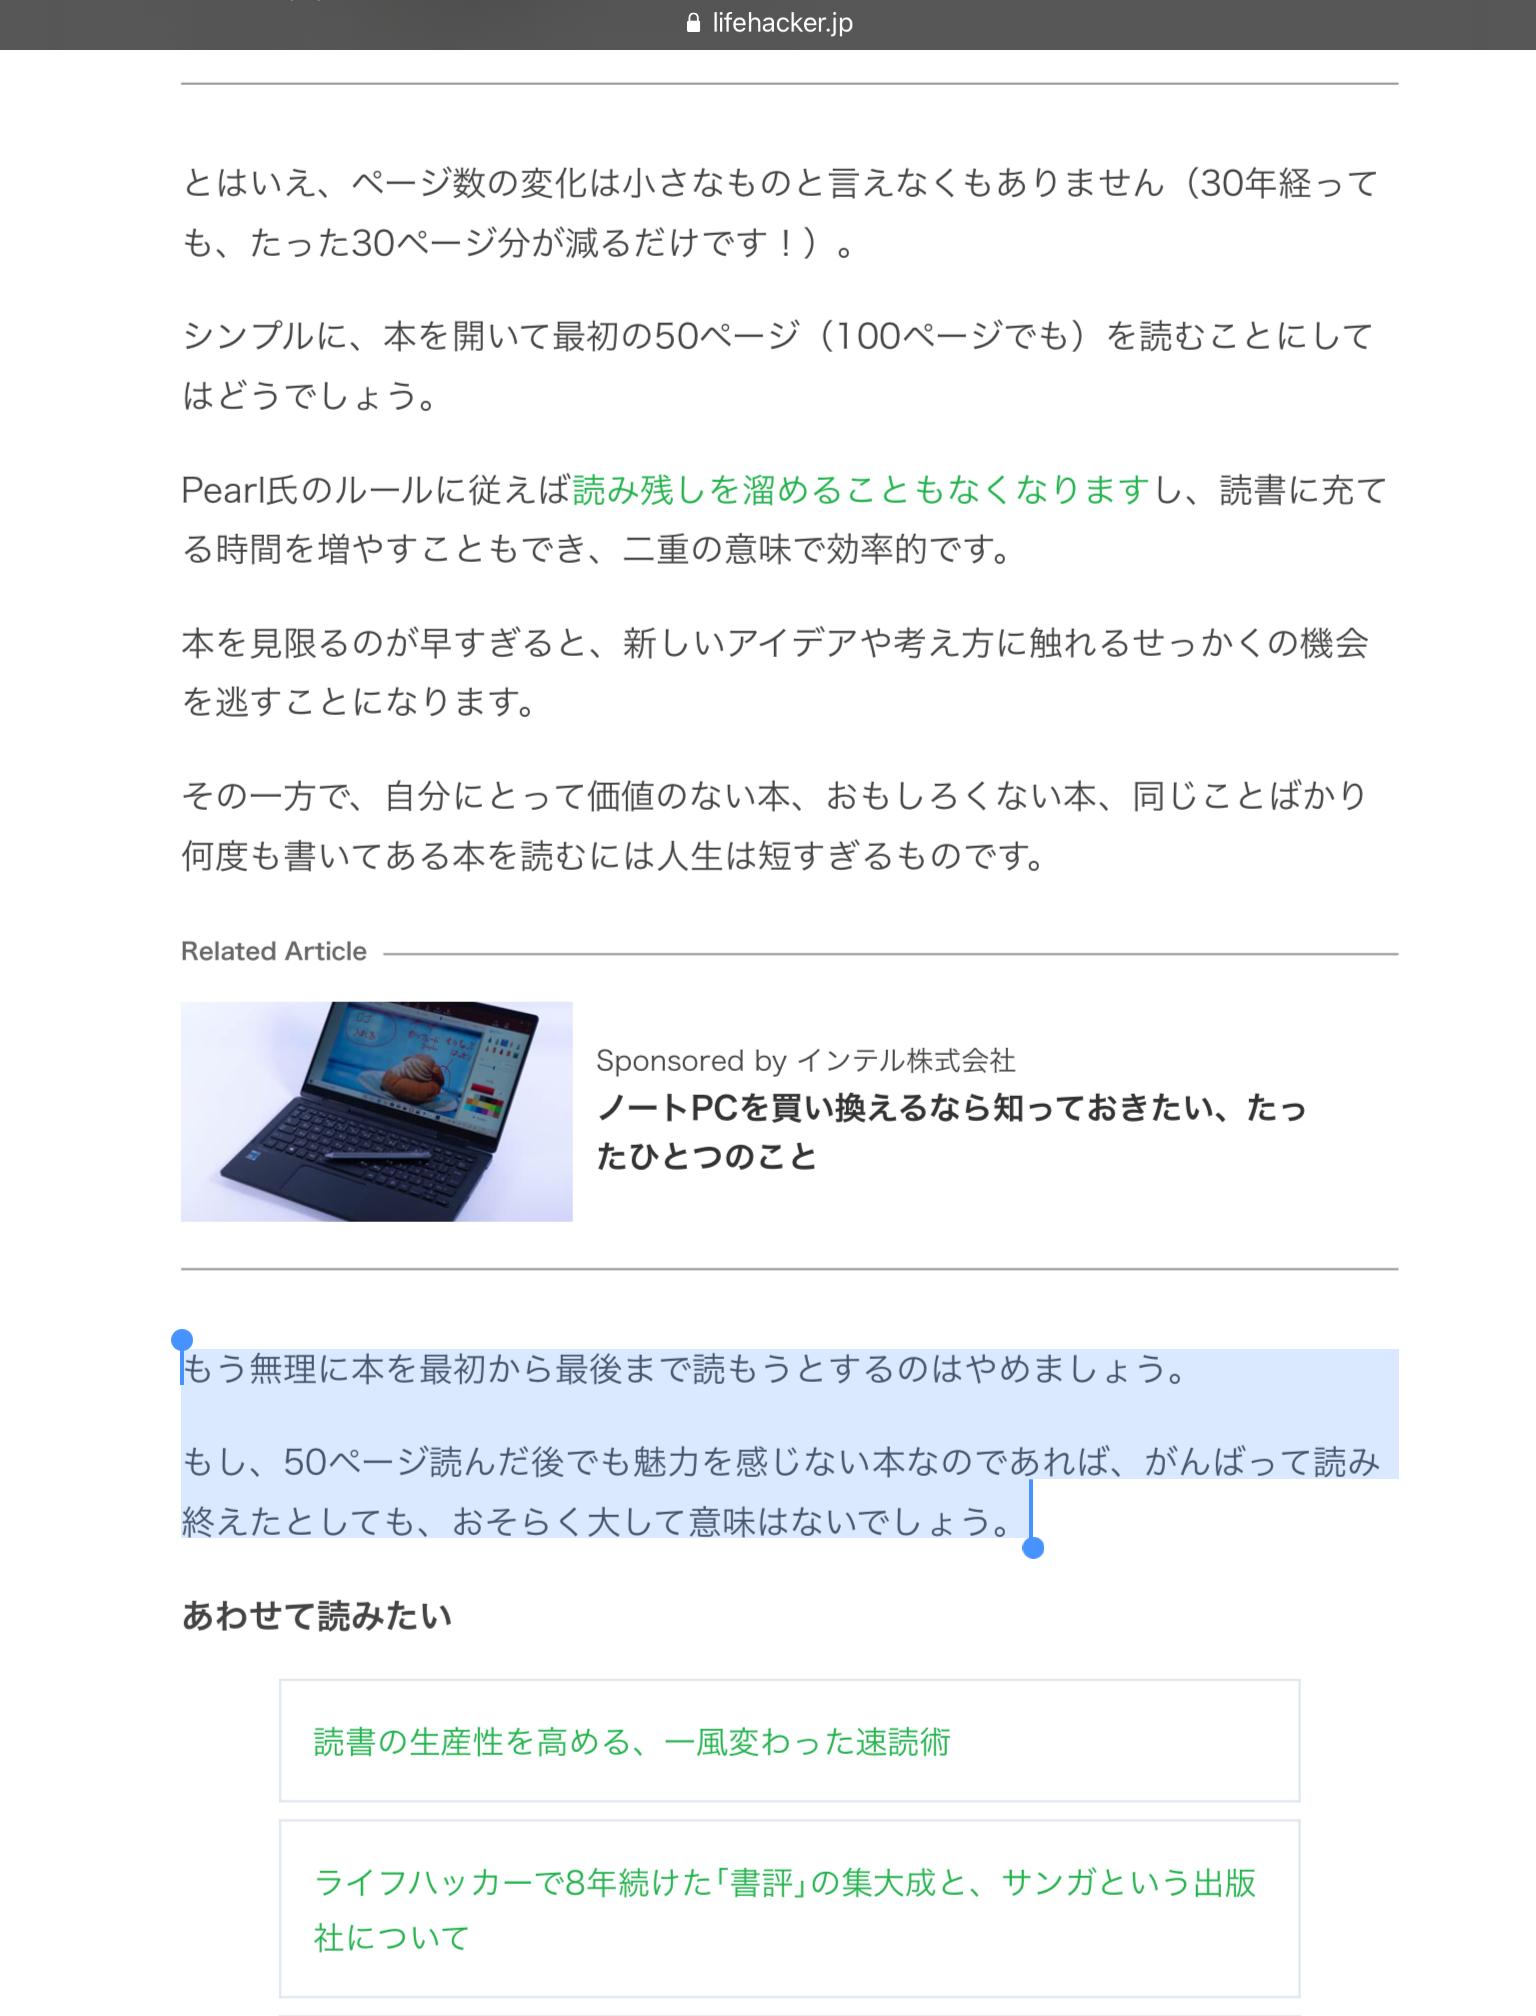 f:id:sorashima:20210105014929p:plain:w637